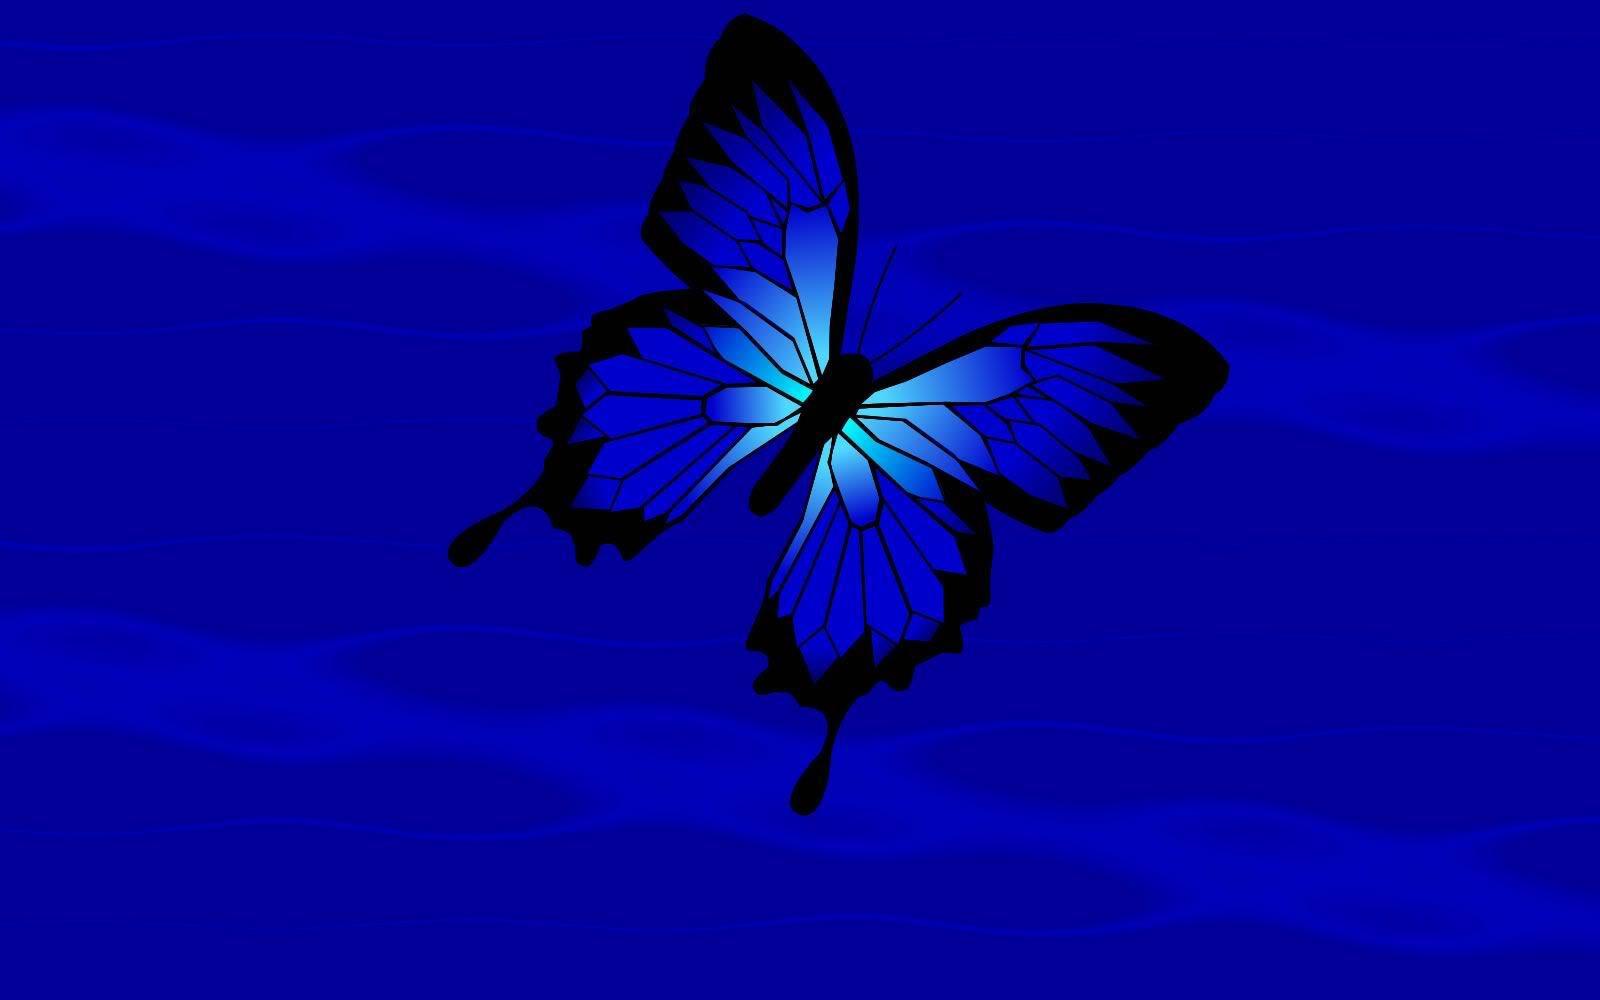 Blue Butterfly HD Wallpaper - WallpaperSafari